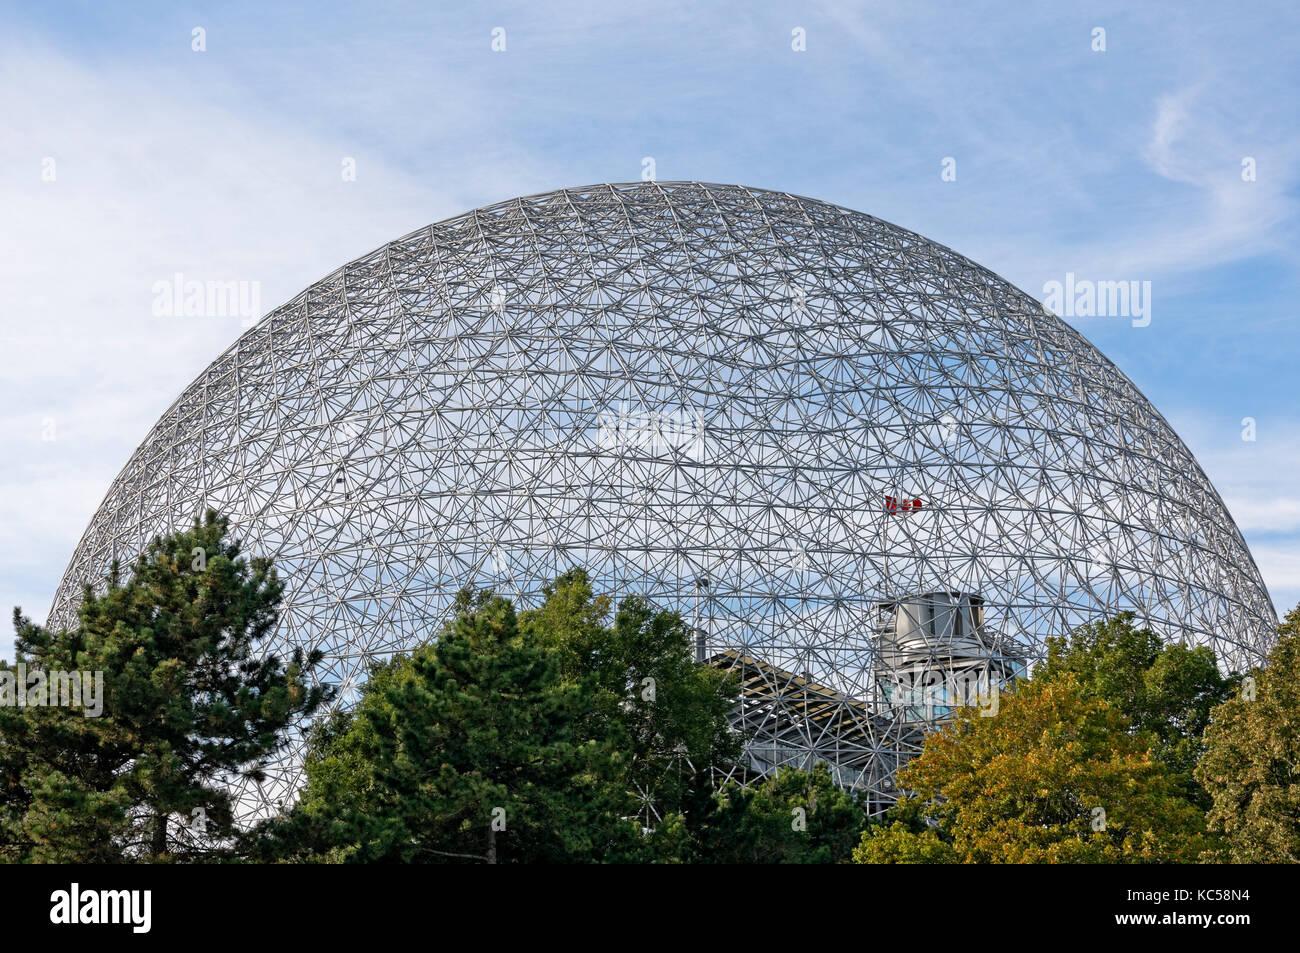 Montreal Biosphäre Umwelt Museum geodätischen Kuppel im Parc Jean Drapeau, Ile Sainte-Helene, Montreal, Stockbild